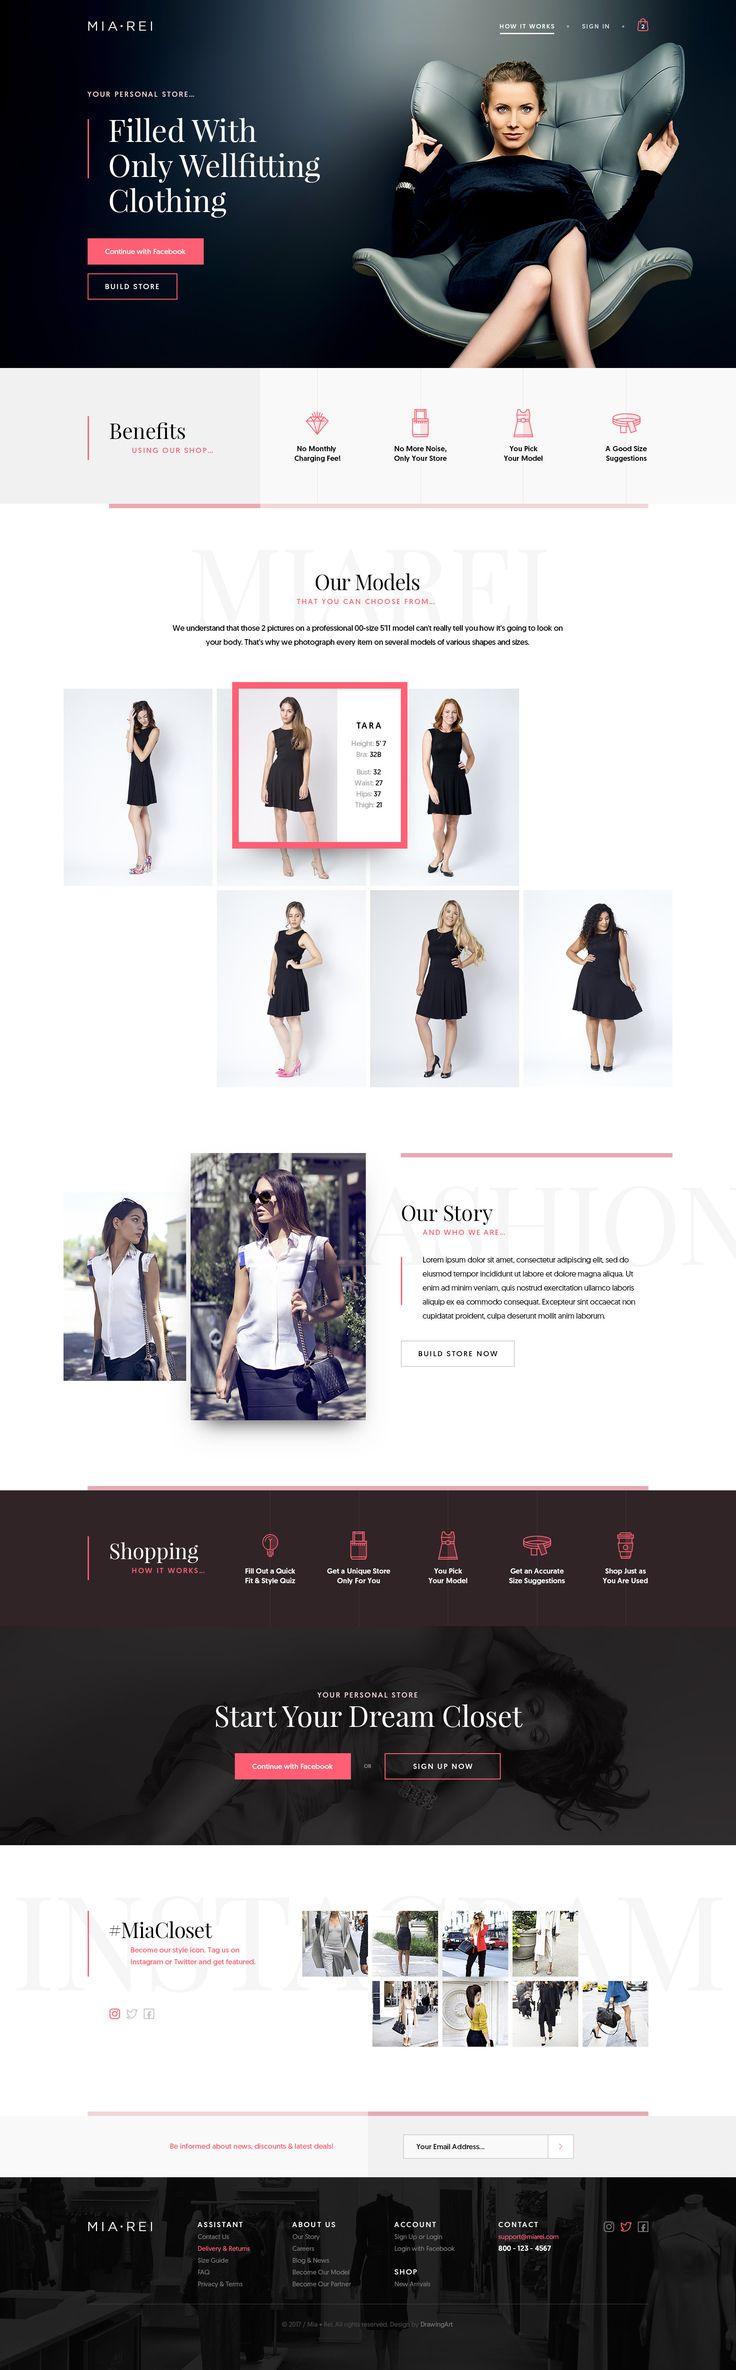 MIA REI https://dribbble.com/shots/3404821-MIA-REI  #drawingart #miarei #dribbble #web #shop #store #personal #wellfitting #clothing #fashion #women #website #webdesign #ui #ux #clean #minimal #responsive